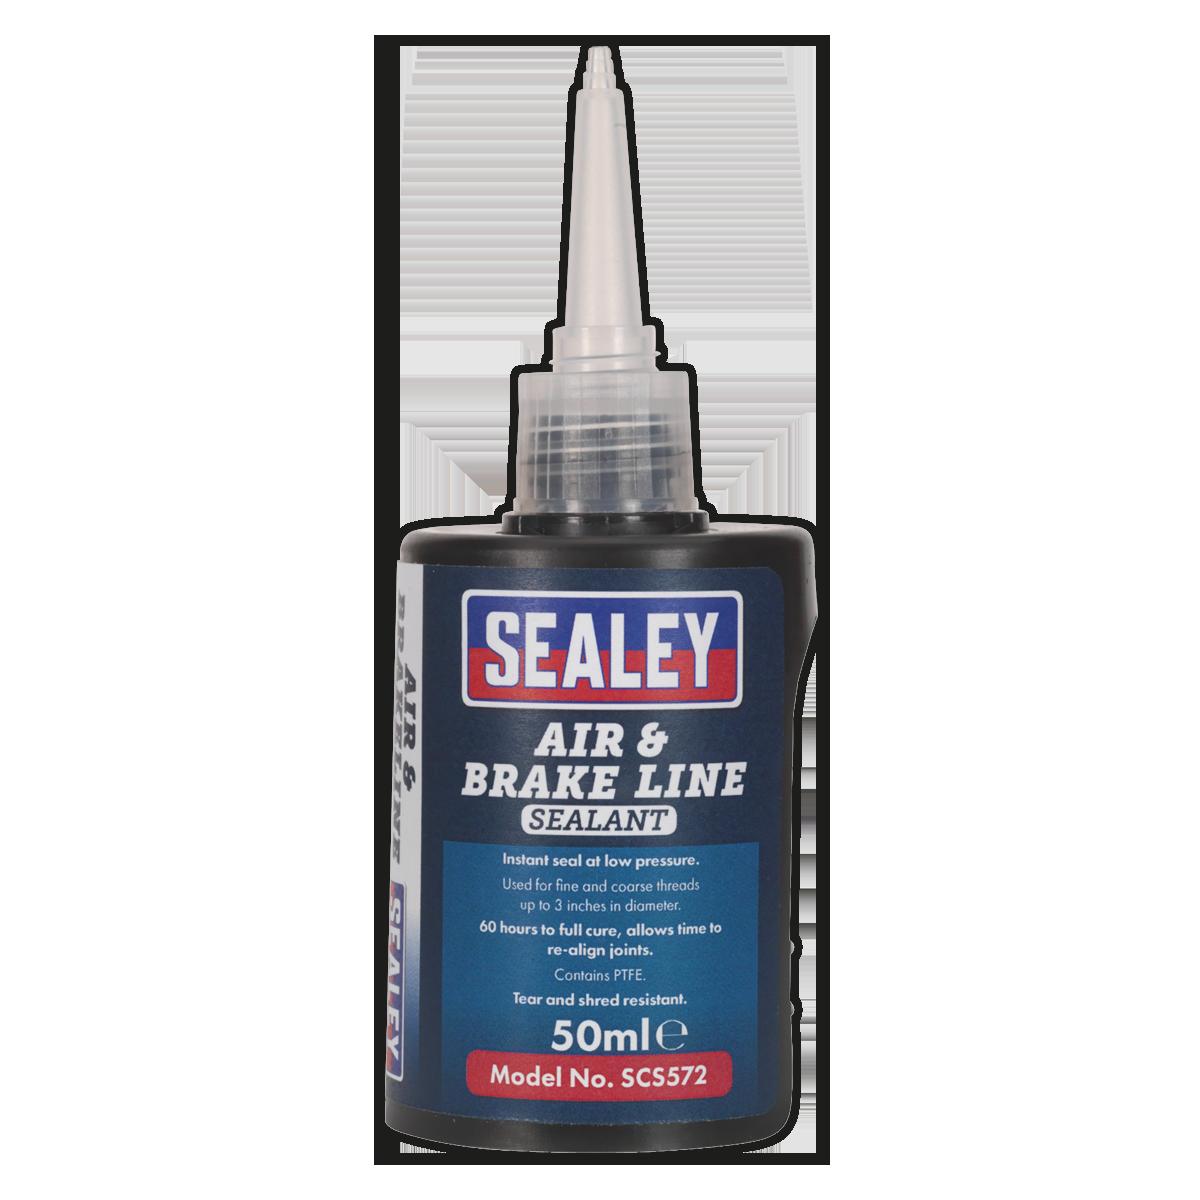 Air & Brake Line Sealant 50ml